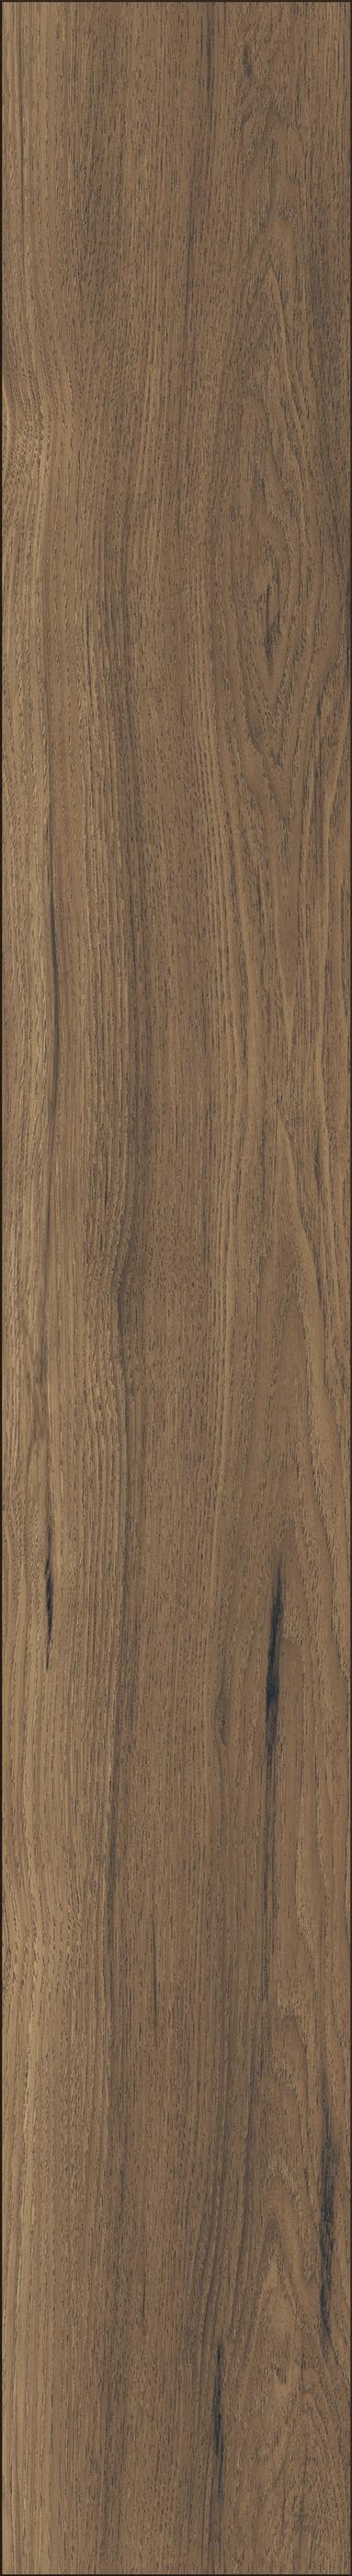 kronotex aqua robusto laminat classic hickory p 1212 von. Black Bedroom Furniture Sets. Home Design Ideas